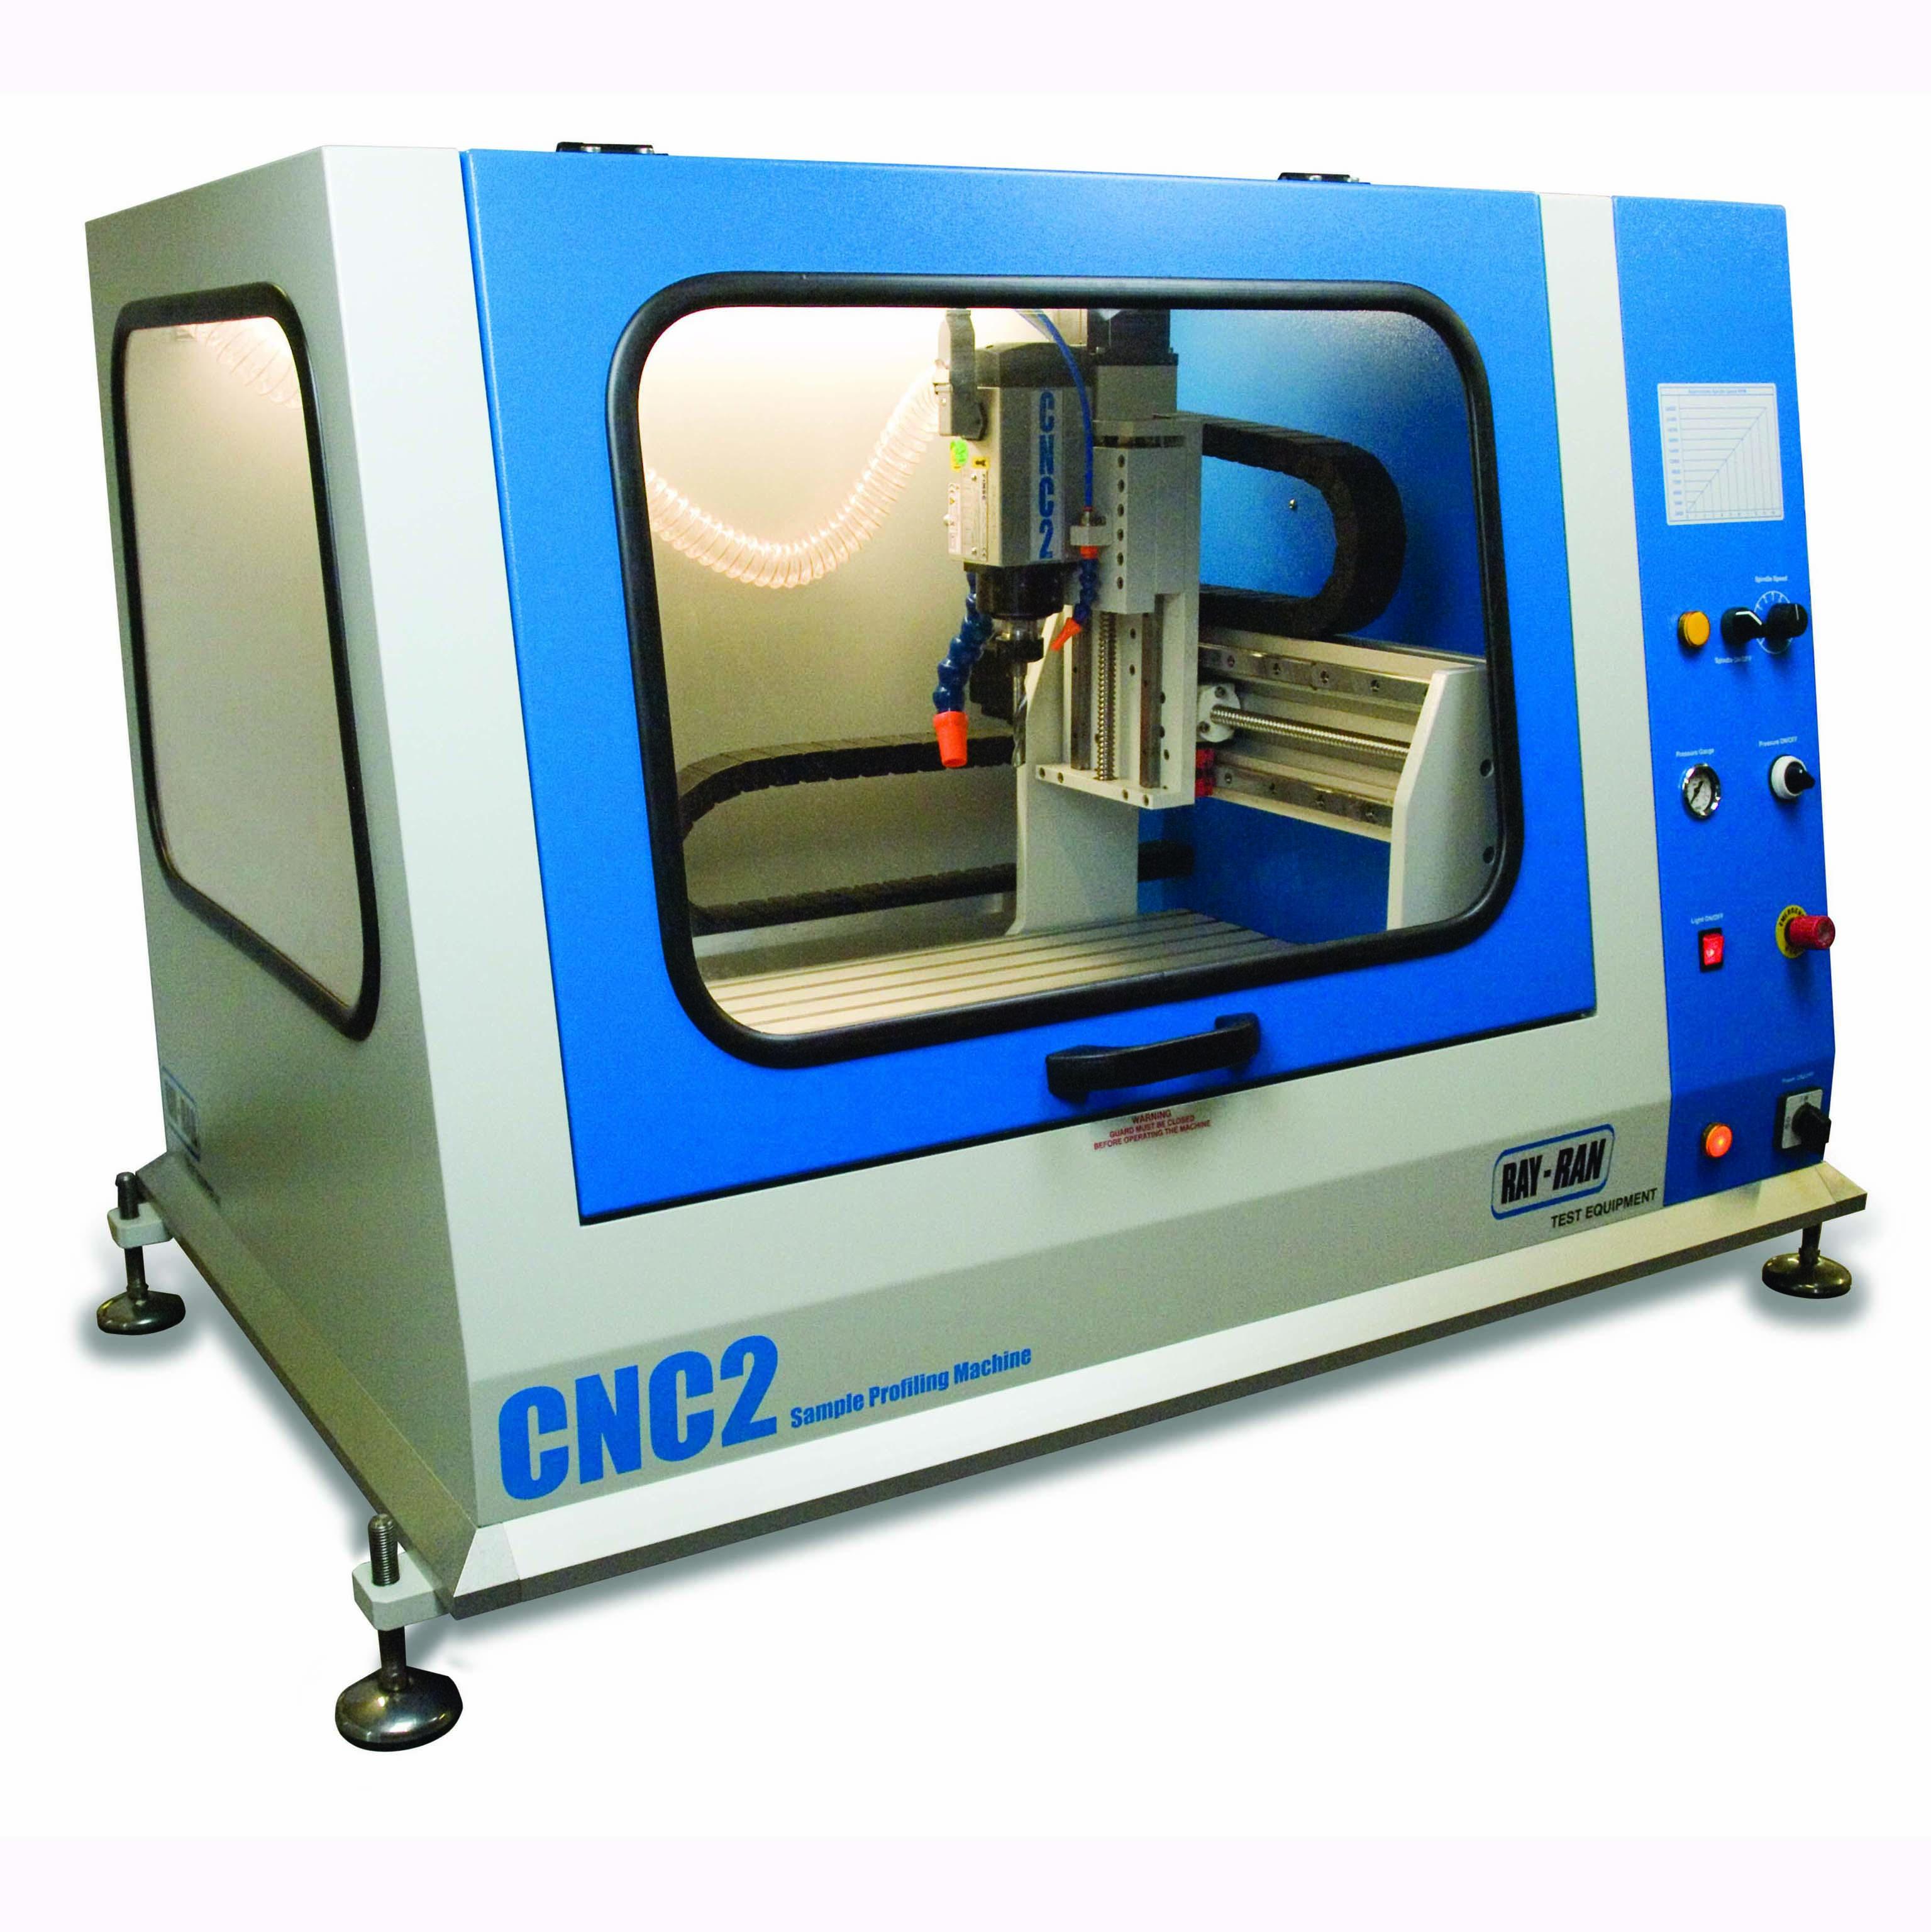 CNC Model 2 Milling Machine.jpg